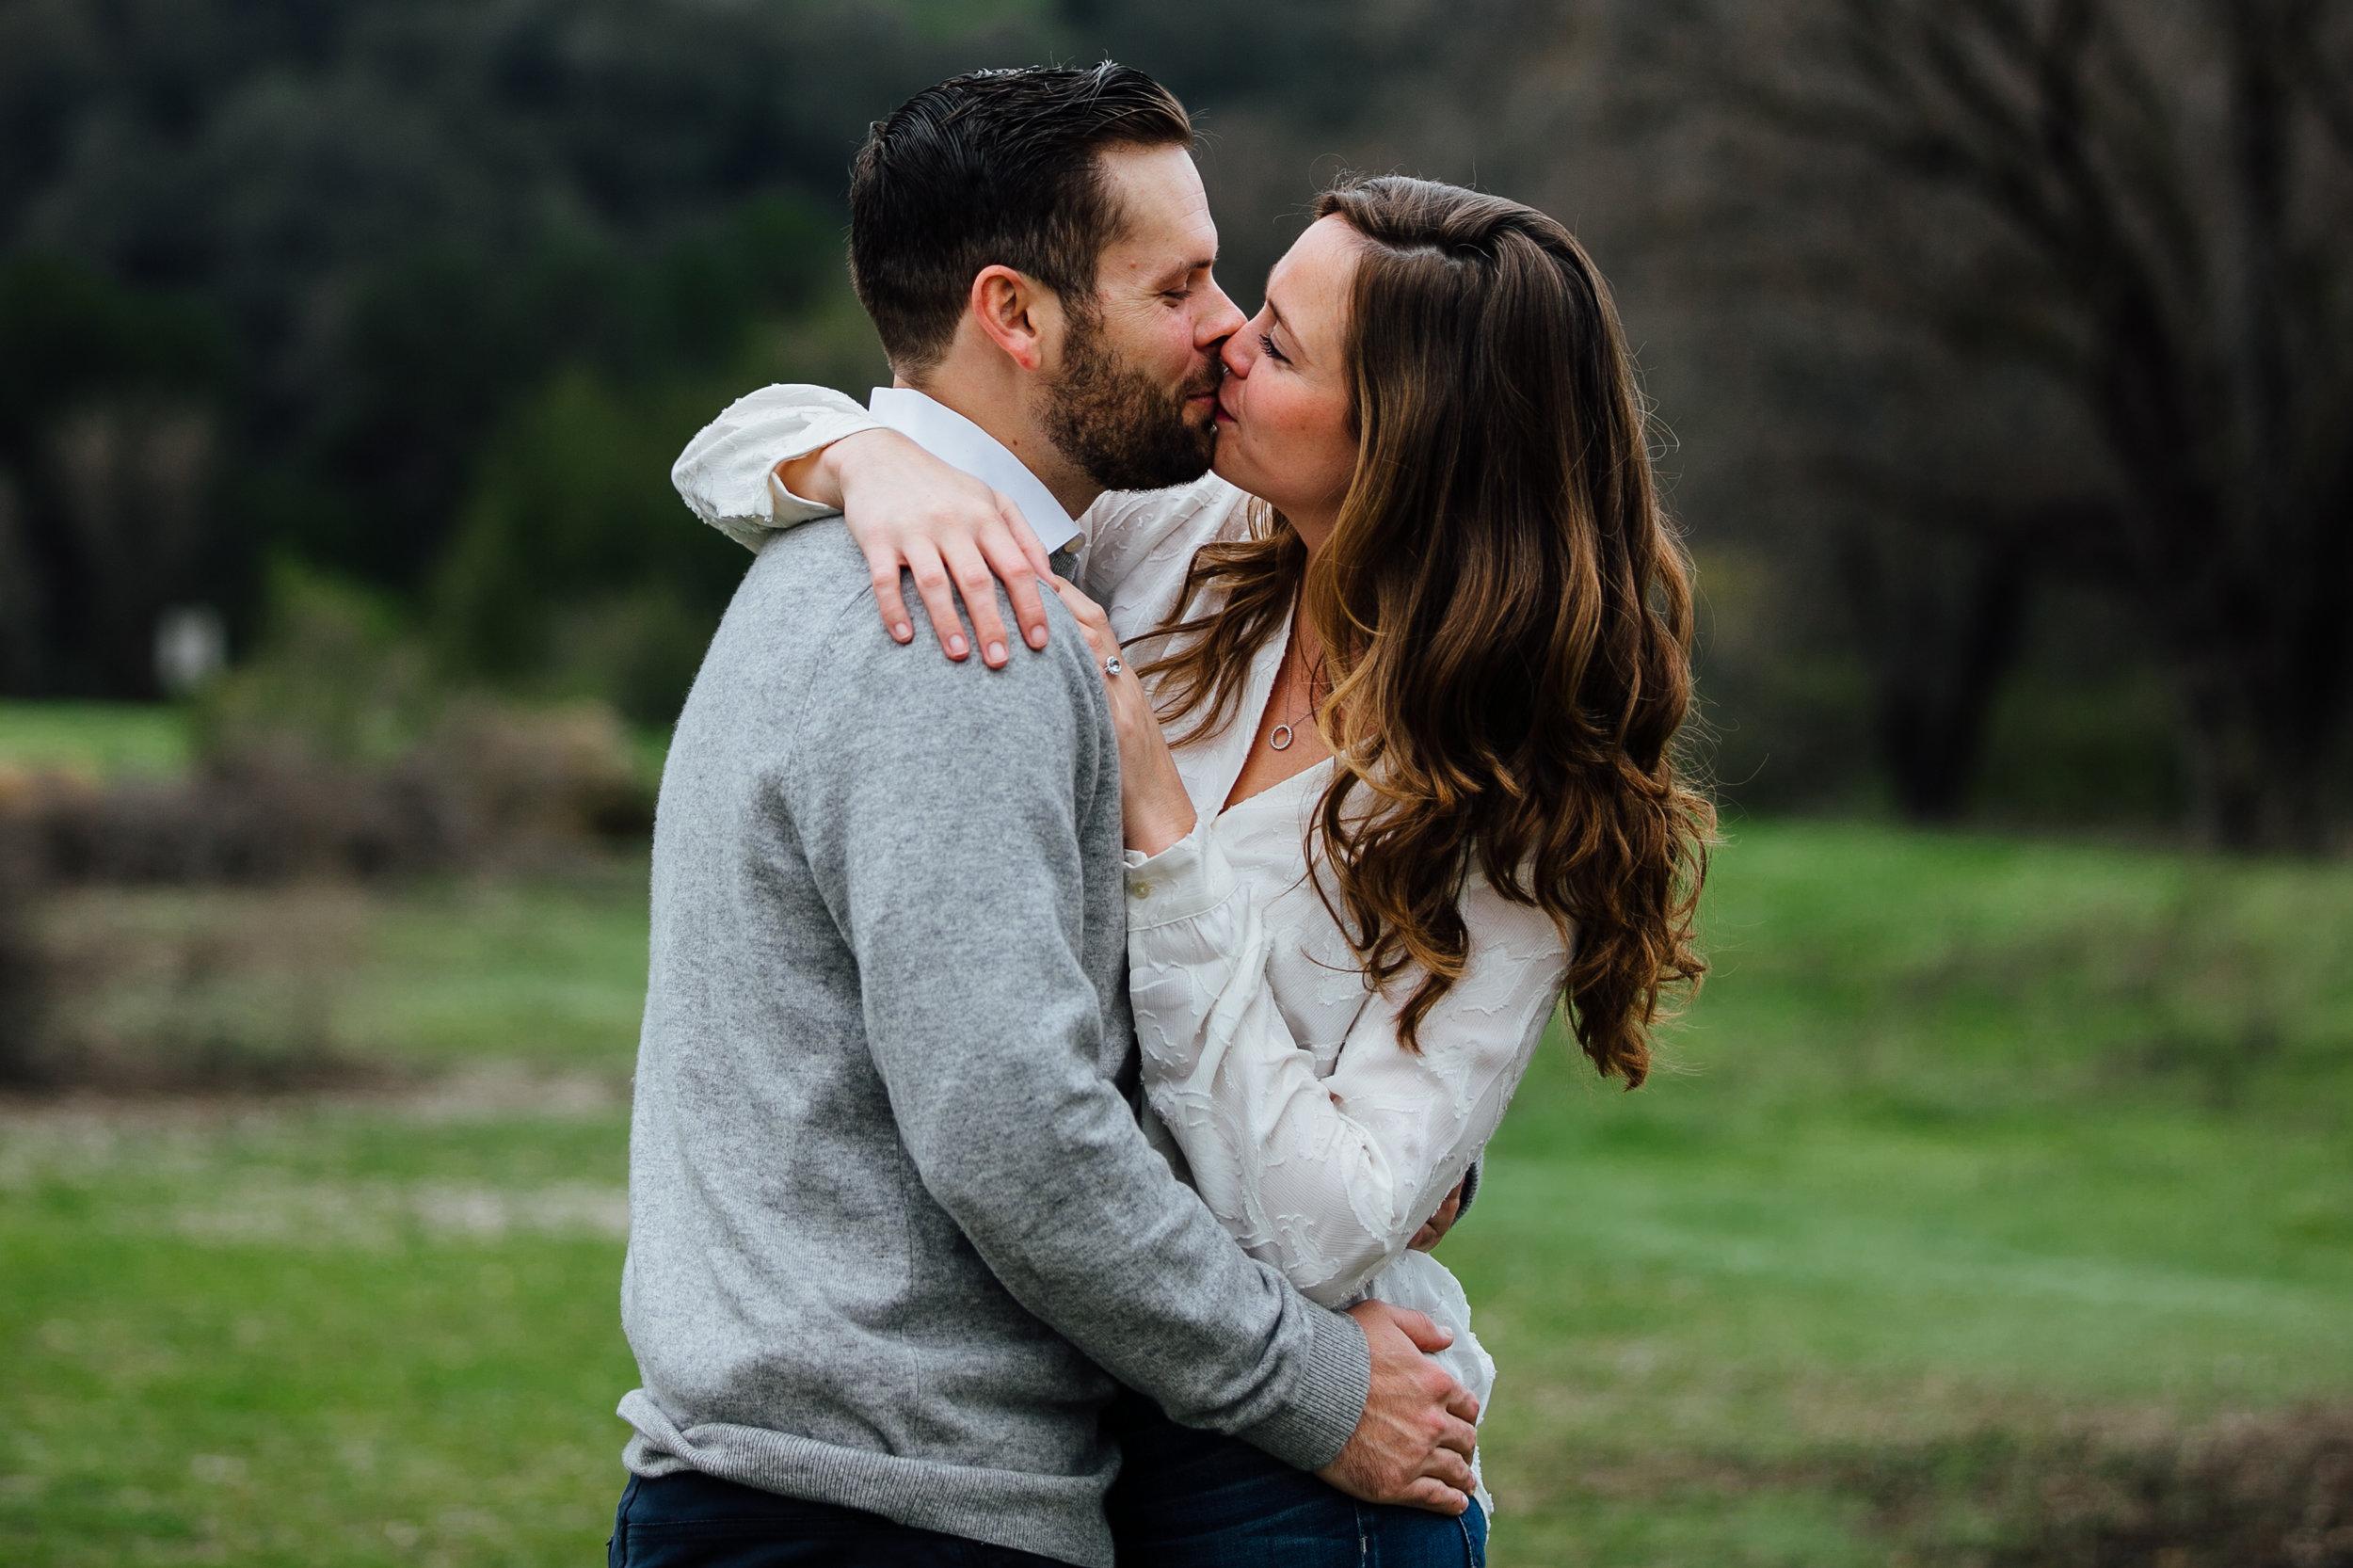 w&j-malibu-canyon-engagement-session-kiss-one